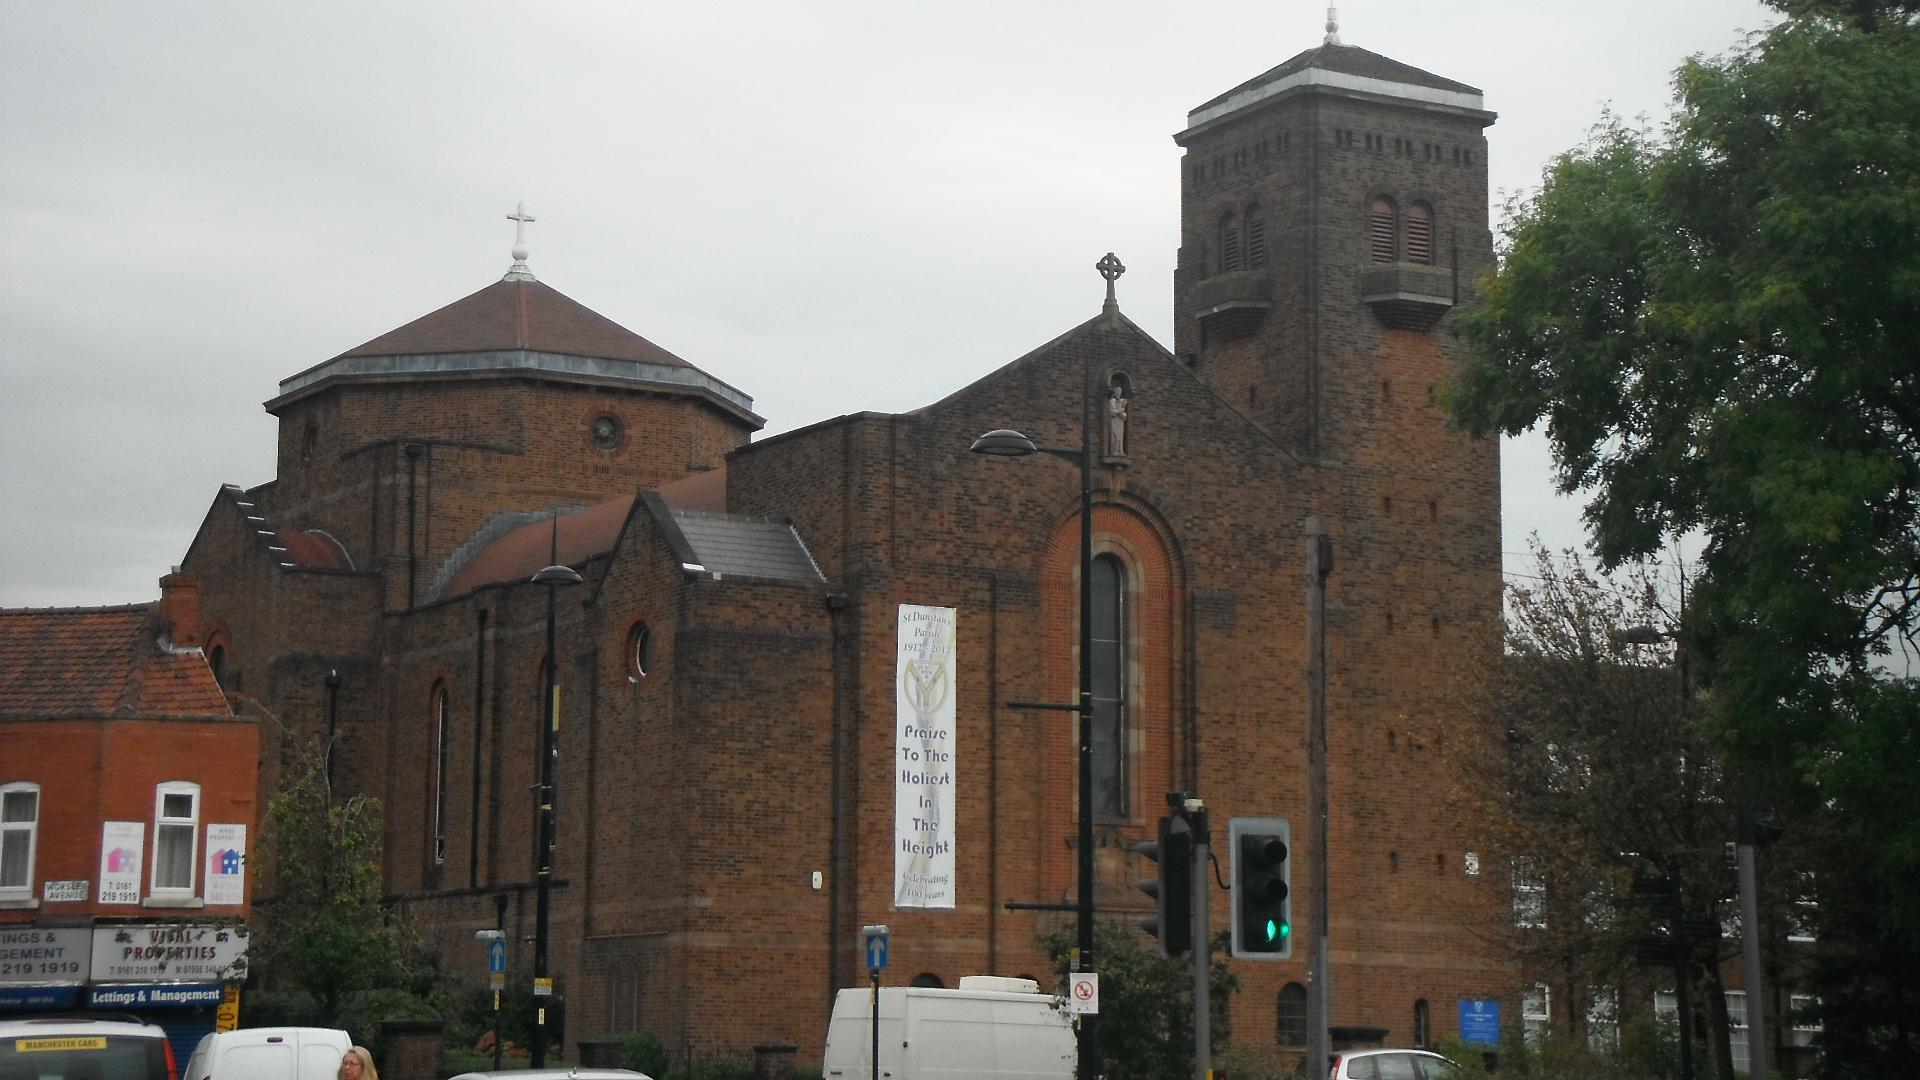 Photo taken by me - St Dunstan's Church - Moton Manchester